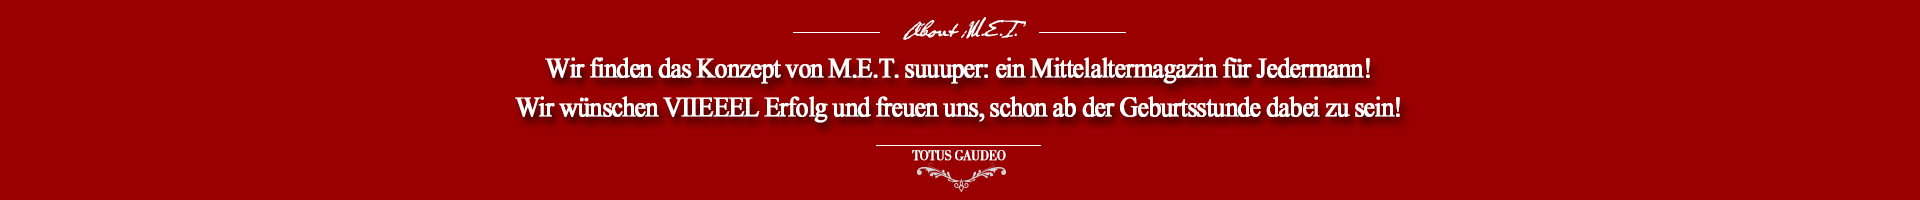 slider-totus-gaudeo